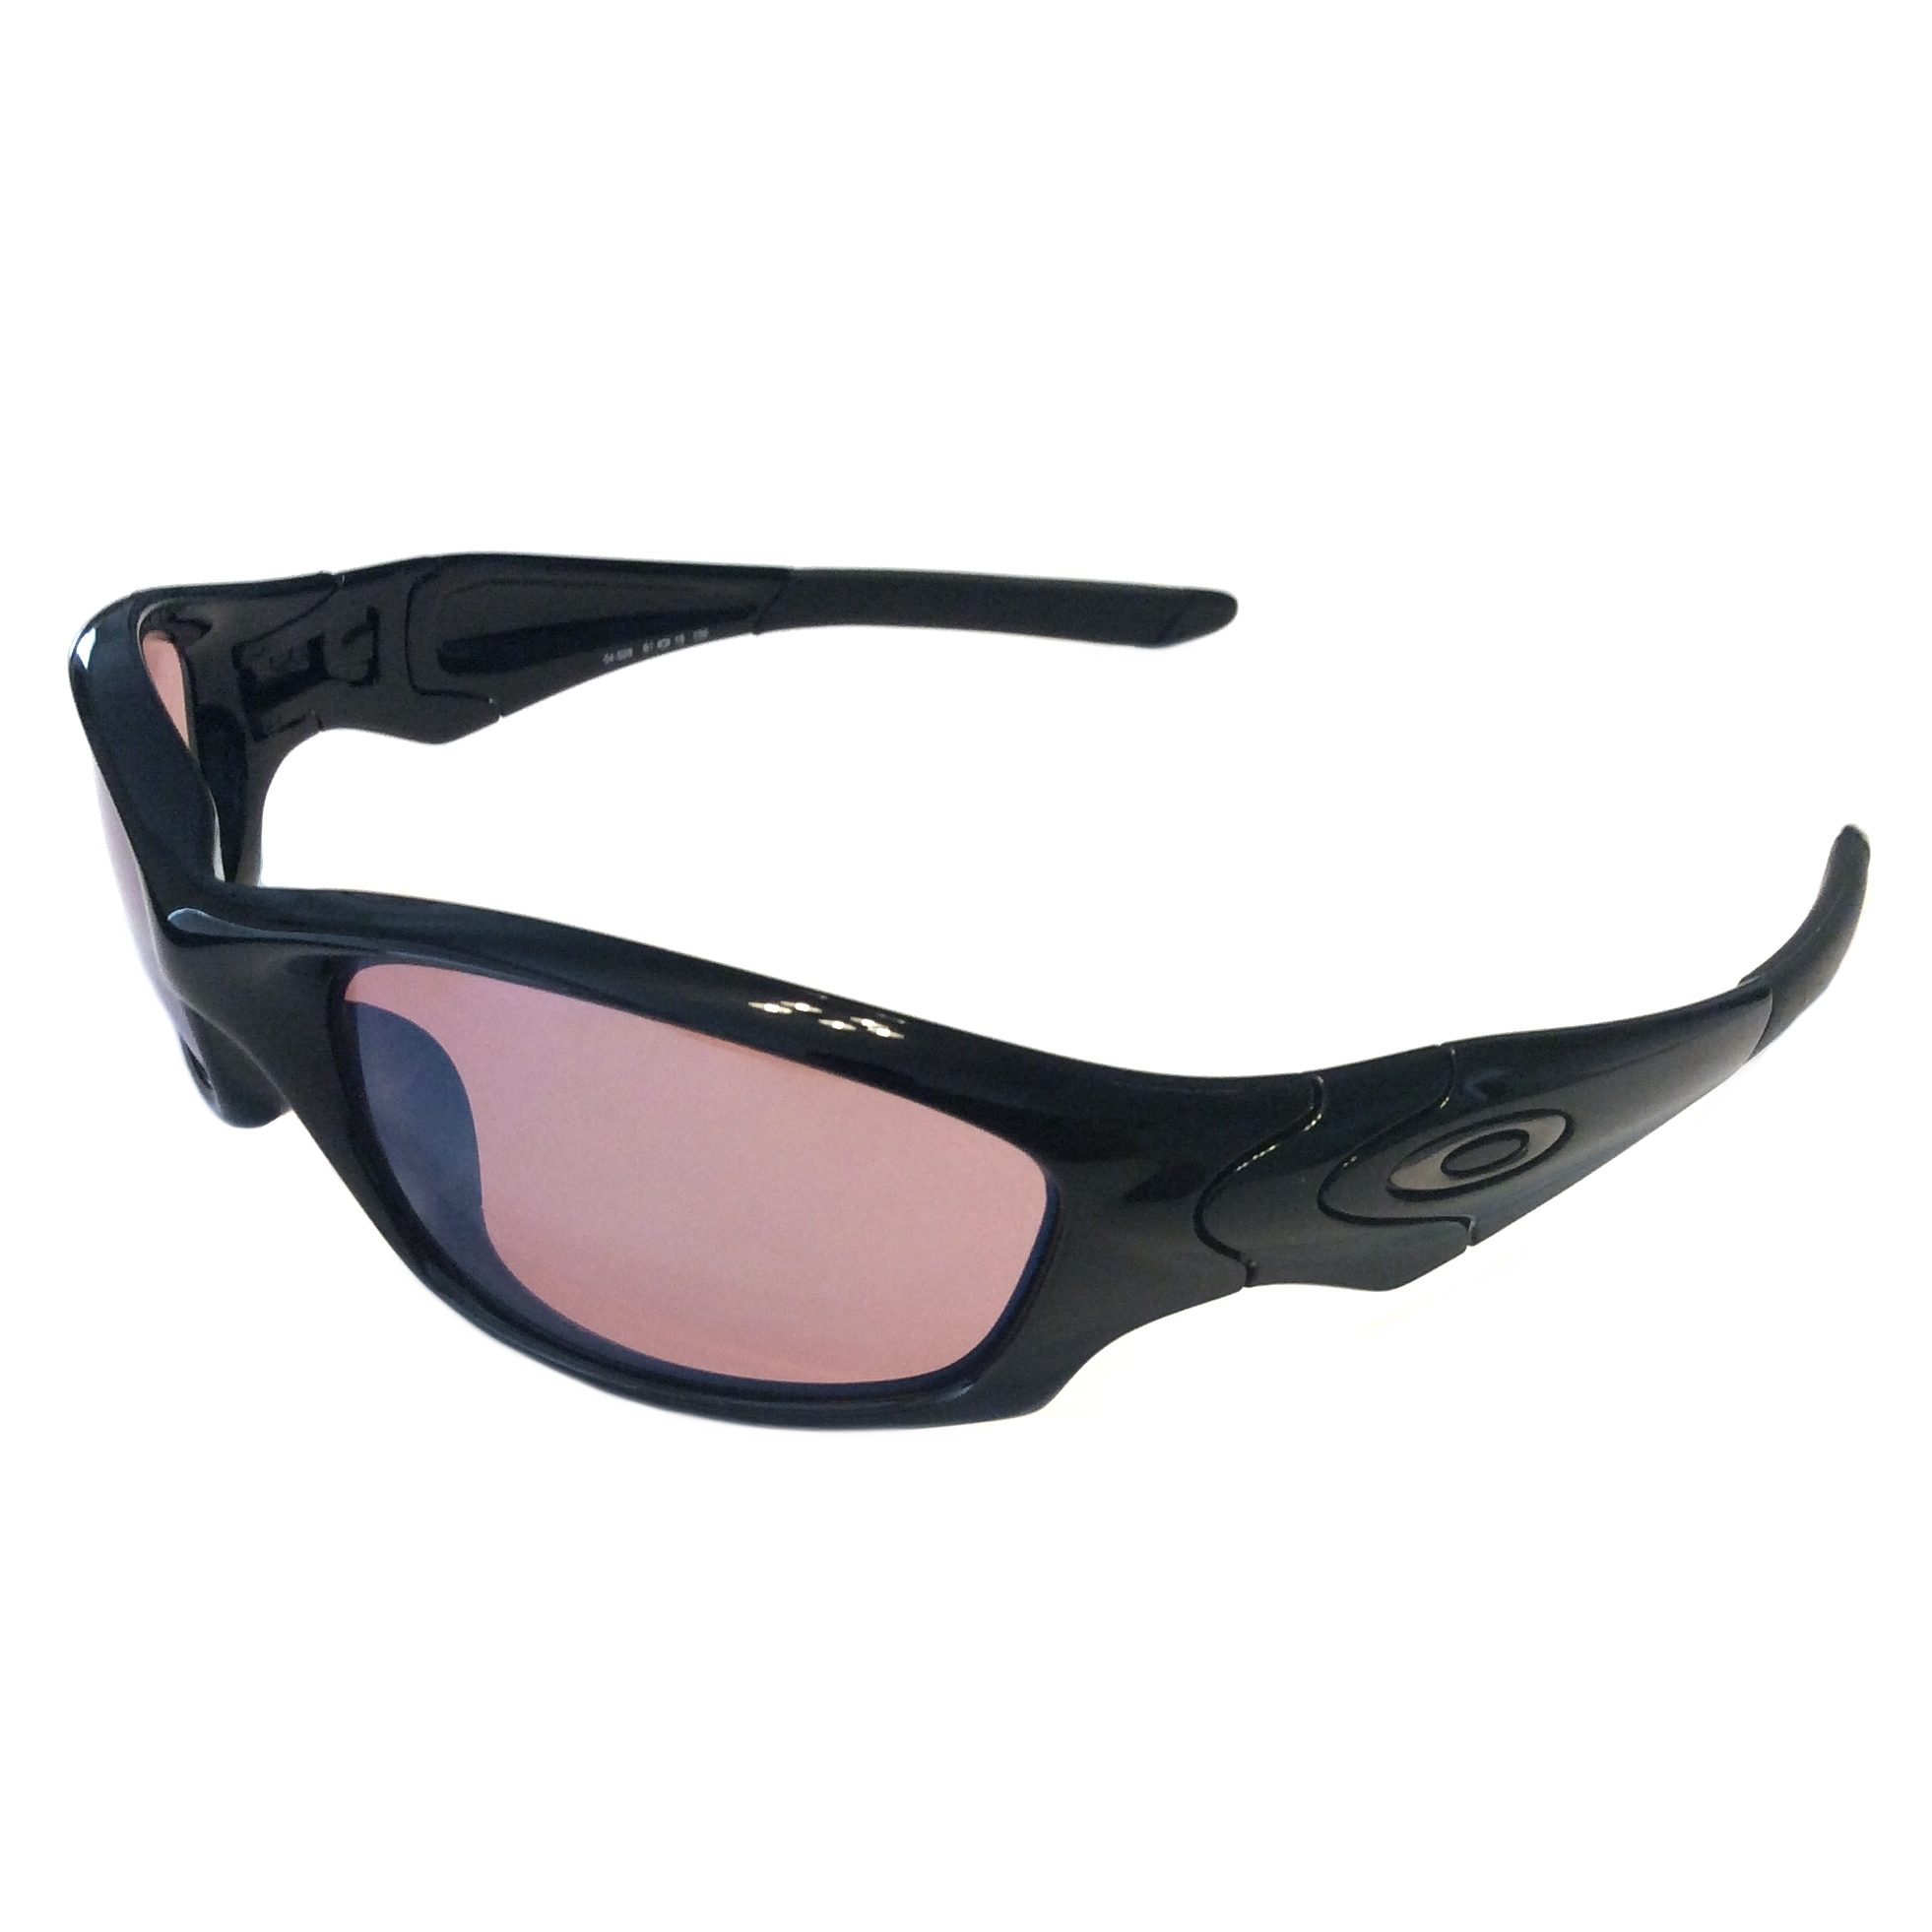 6b8fcd6aff Oakley Straight Jacket Sunglasses - Polished Black - G30 Iridium 04-328